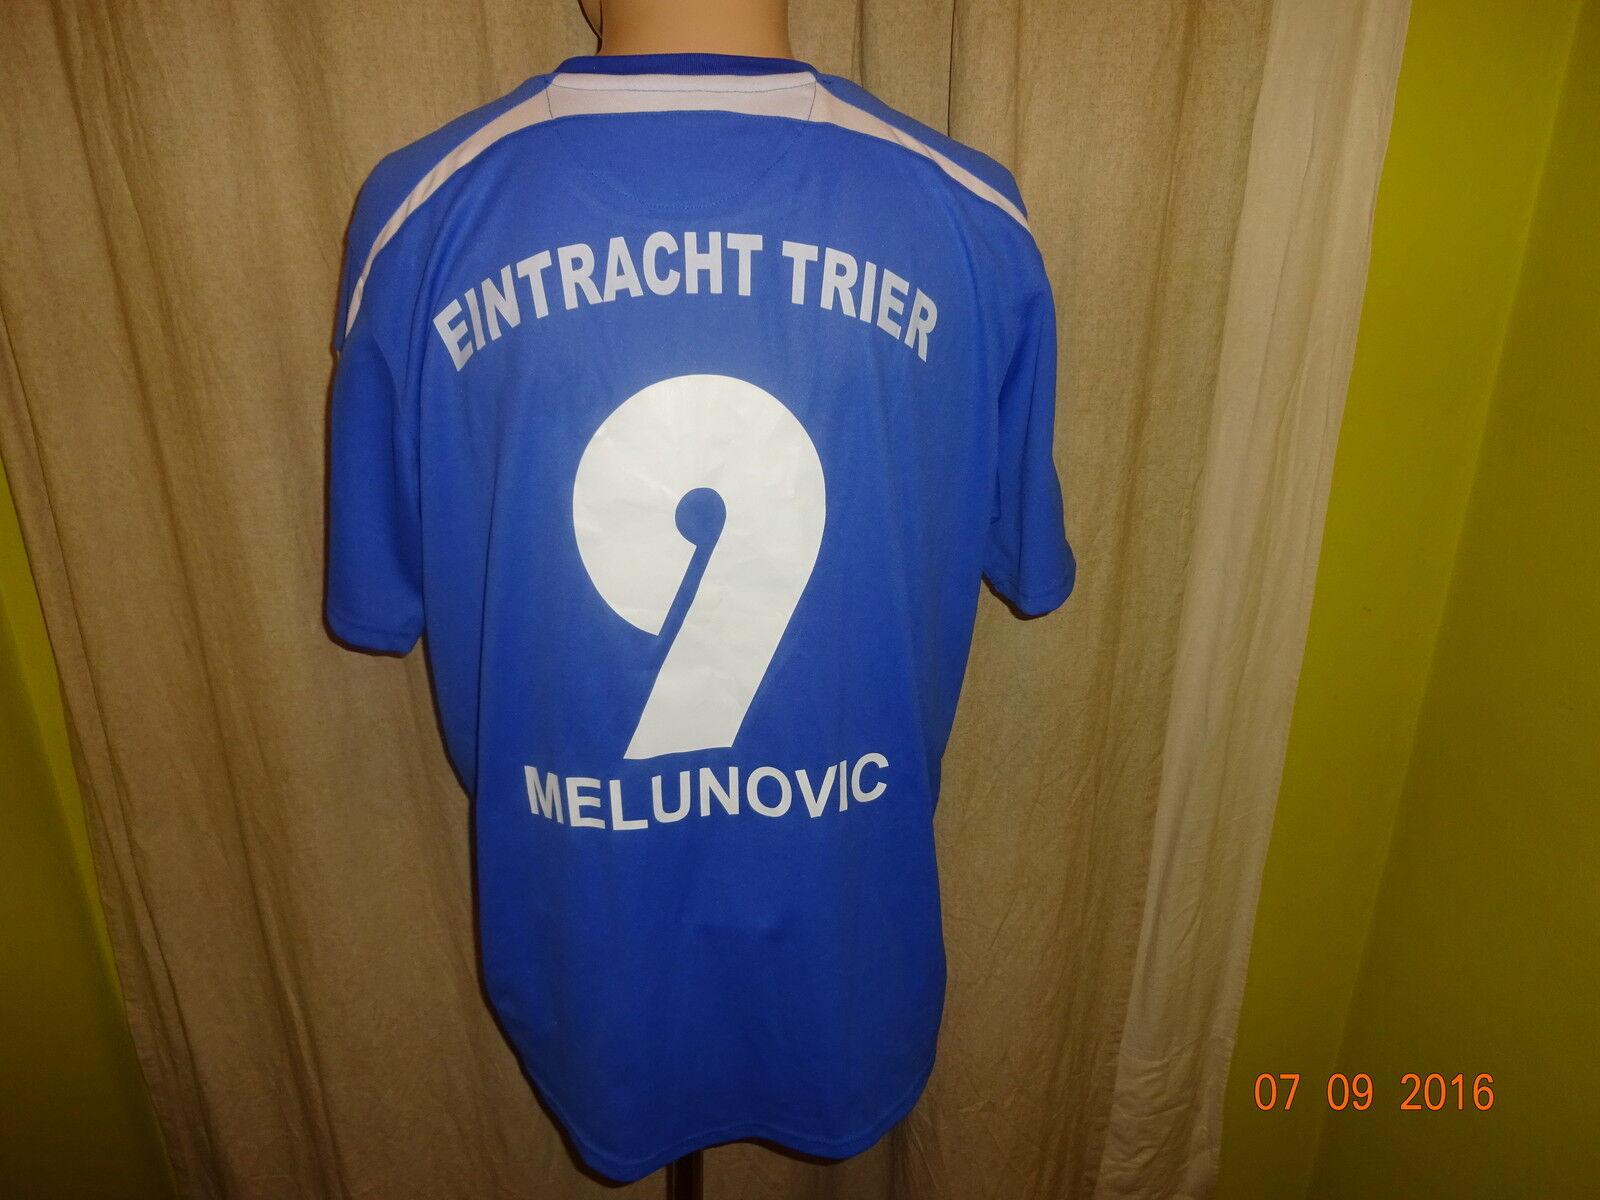 Eintracht Trier Nr.9 uhlsport Heim Matchworn Trikot 2008/09 + Nr.9 Trier Melunovic Gr.L 63e56f